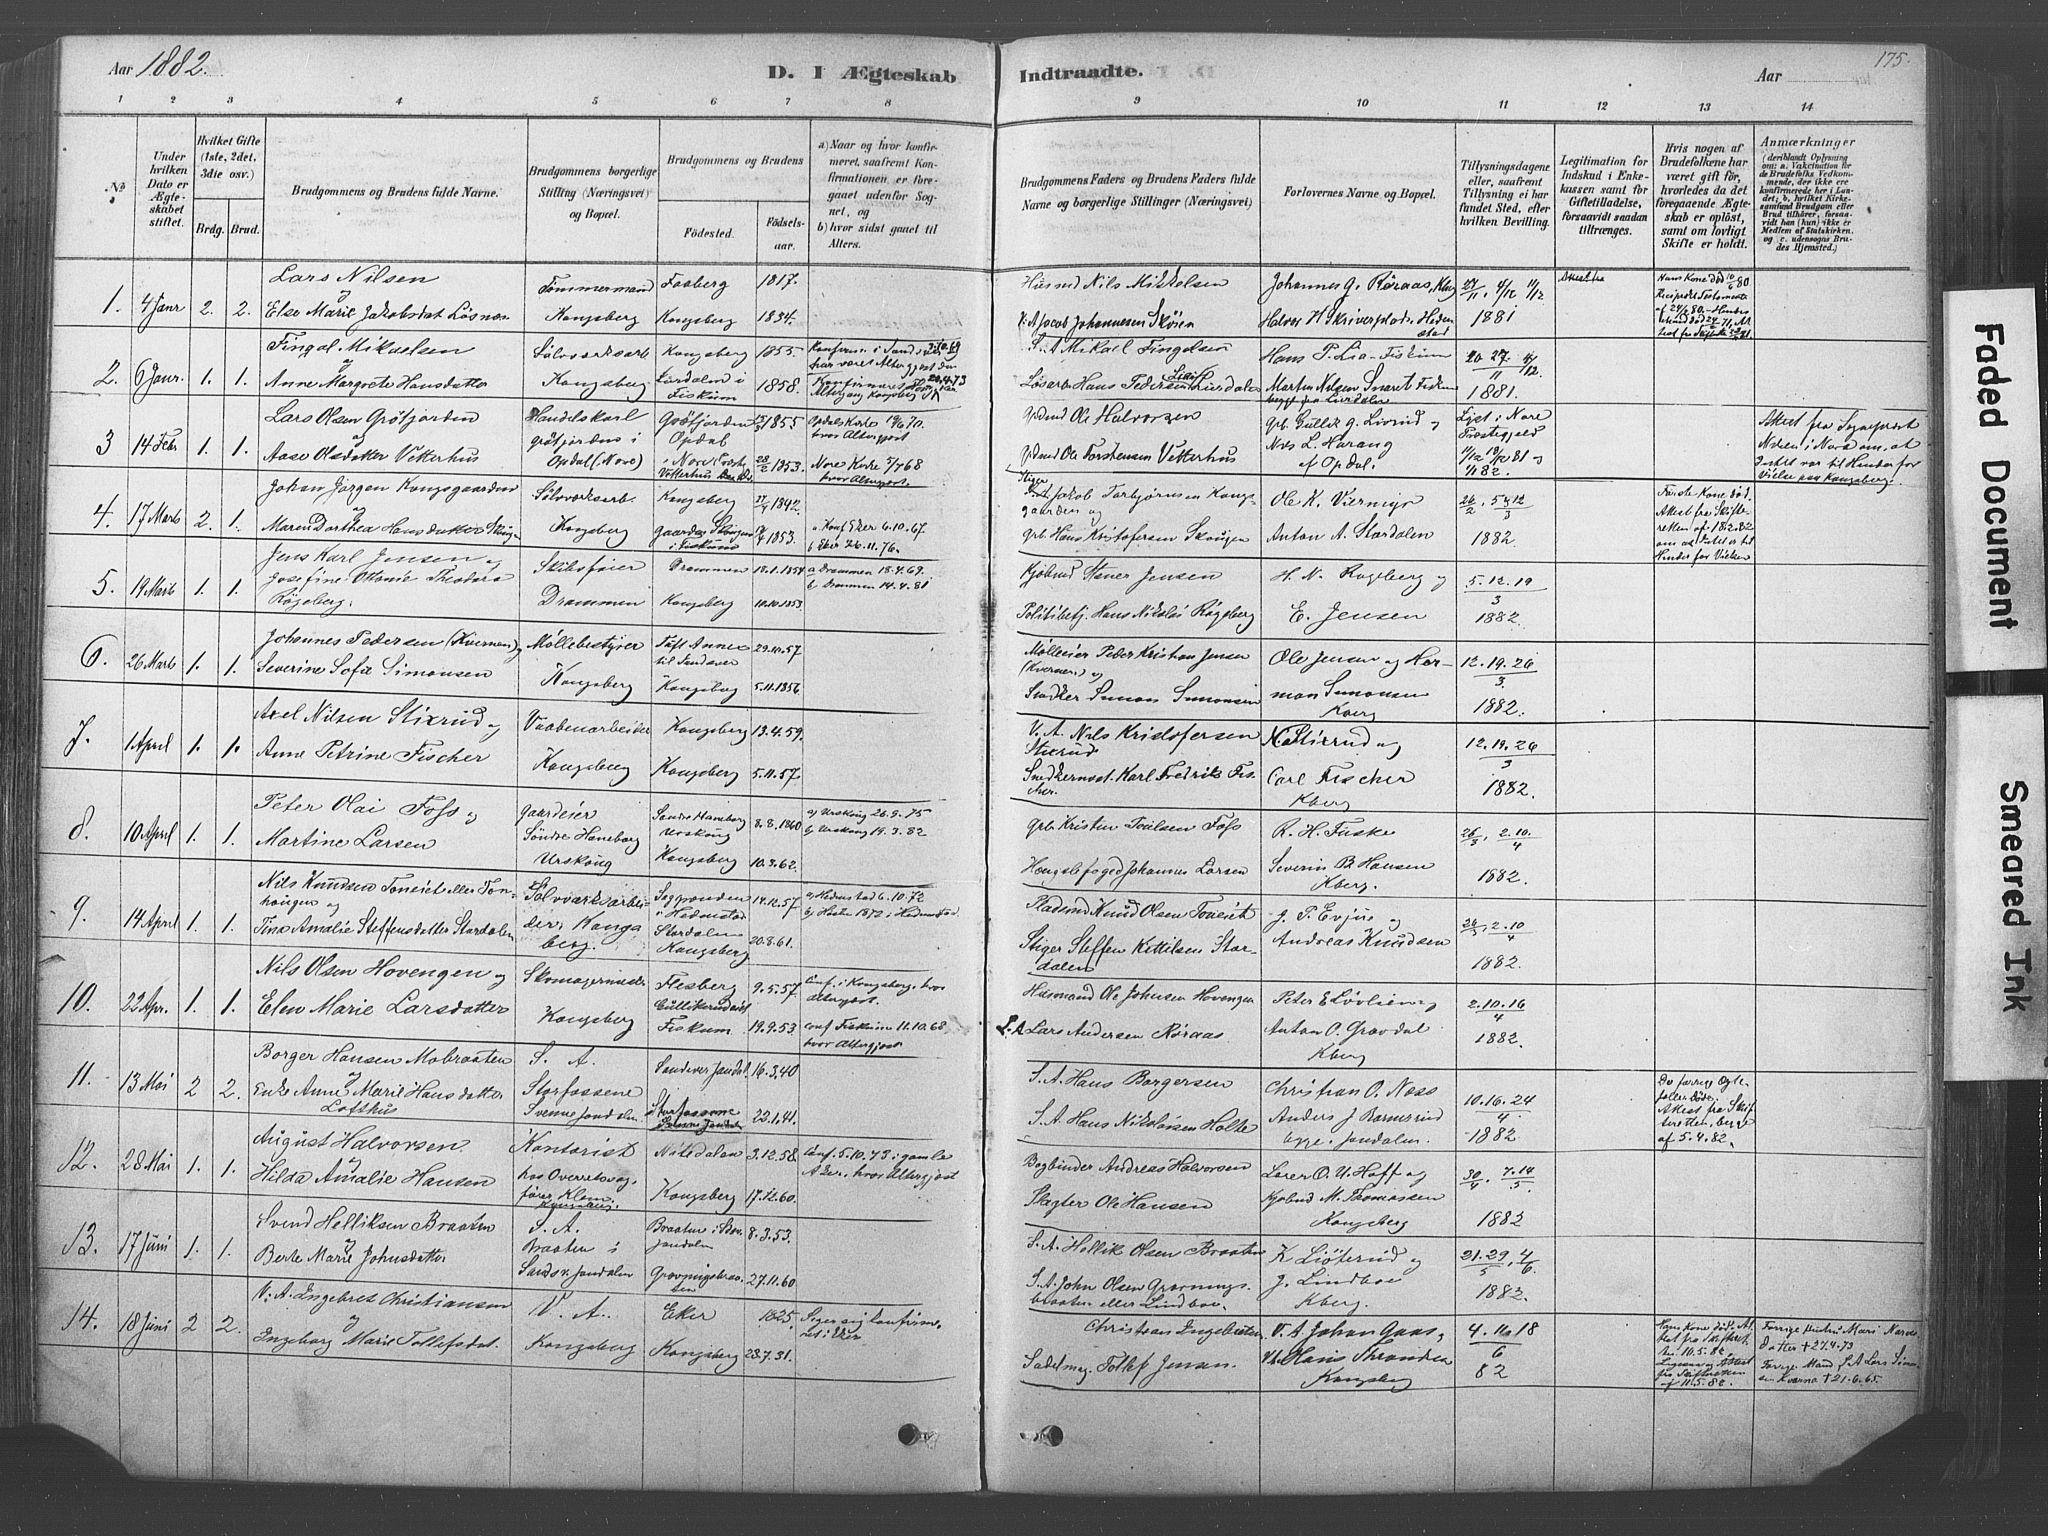 SAKO, Kongsberg kirkebøker, F/Fb/L0001: Ministerialbok nr. II 1, 1878-1886, s. 175